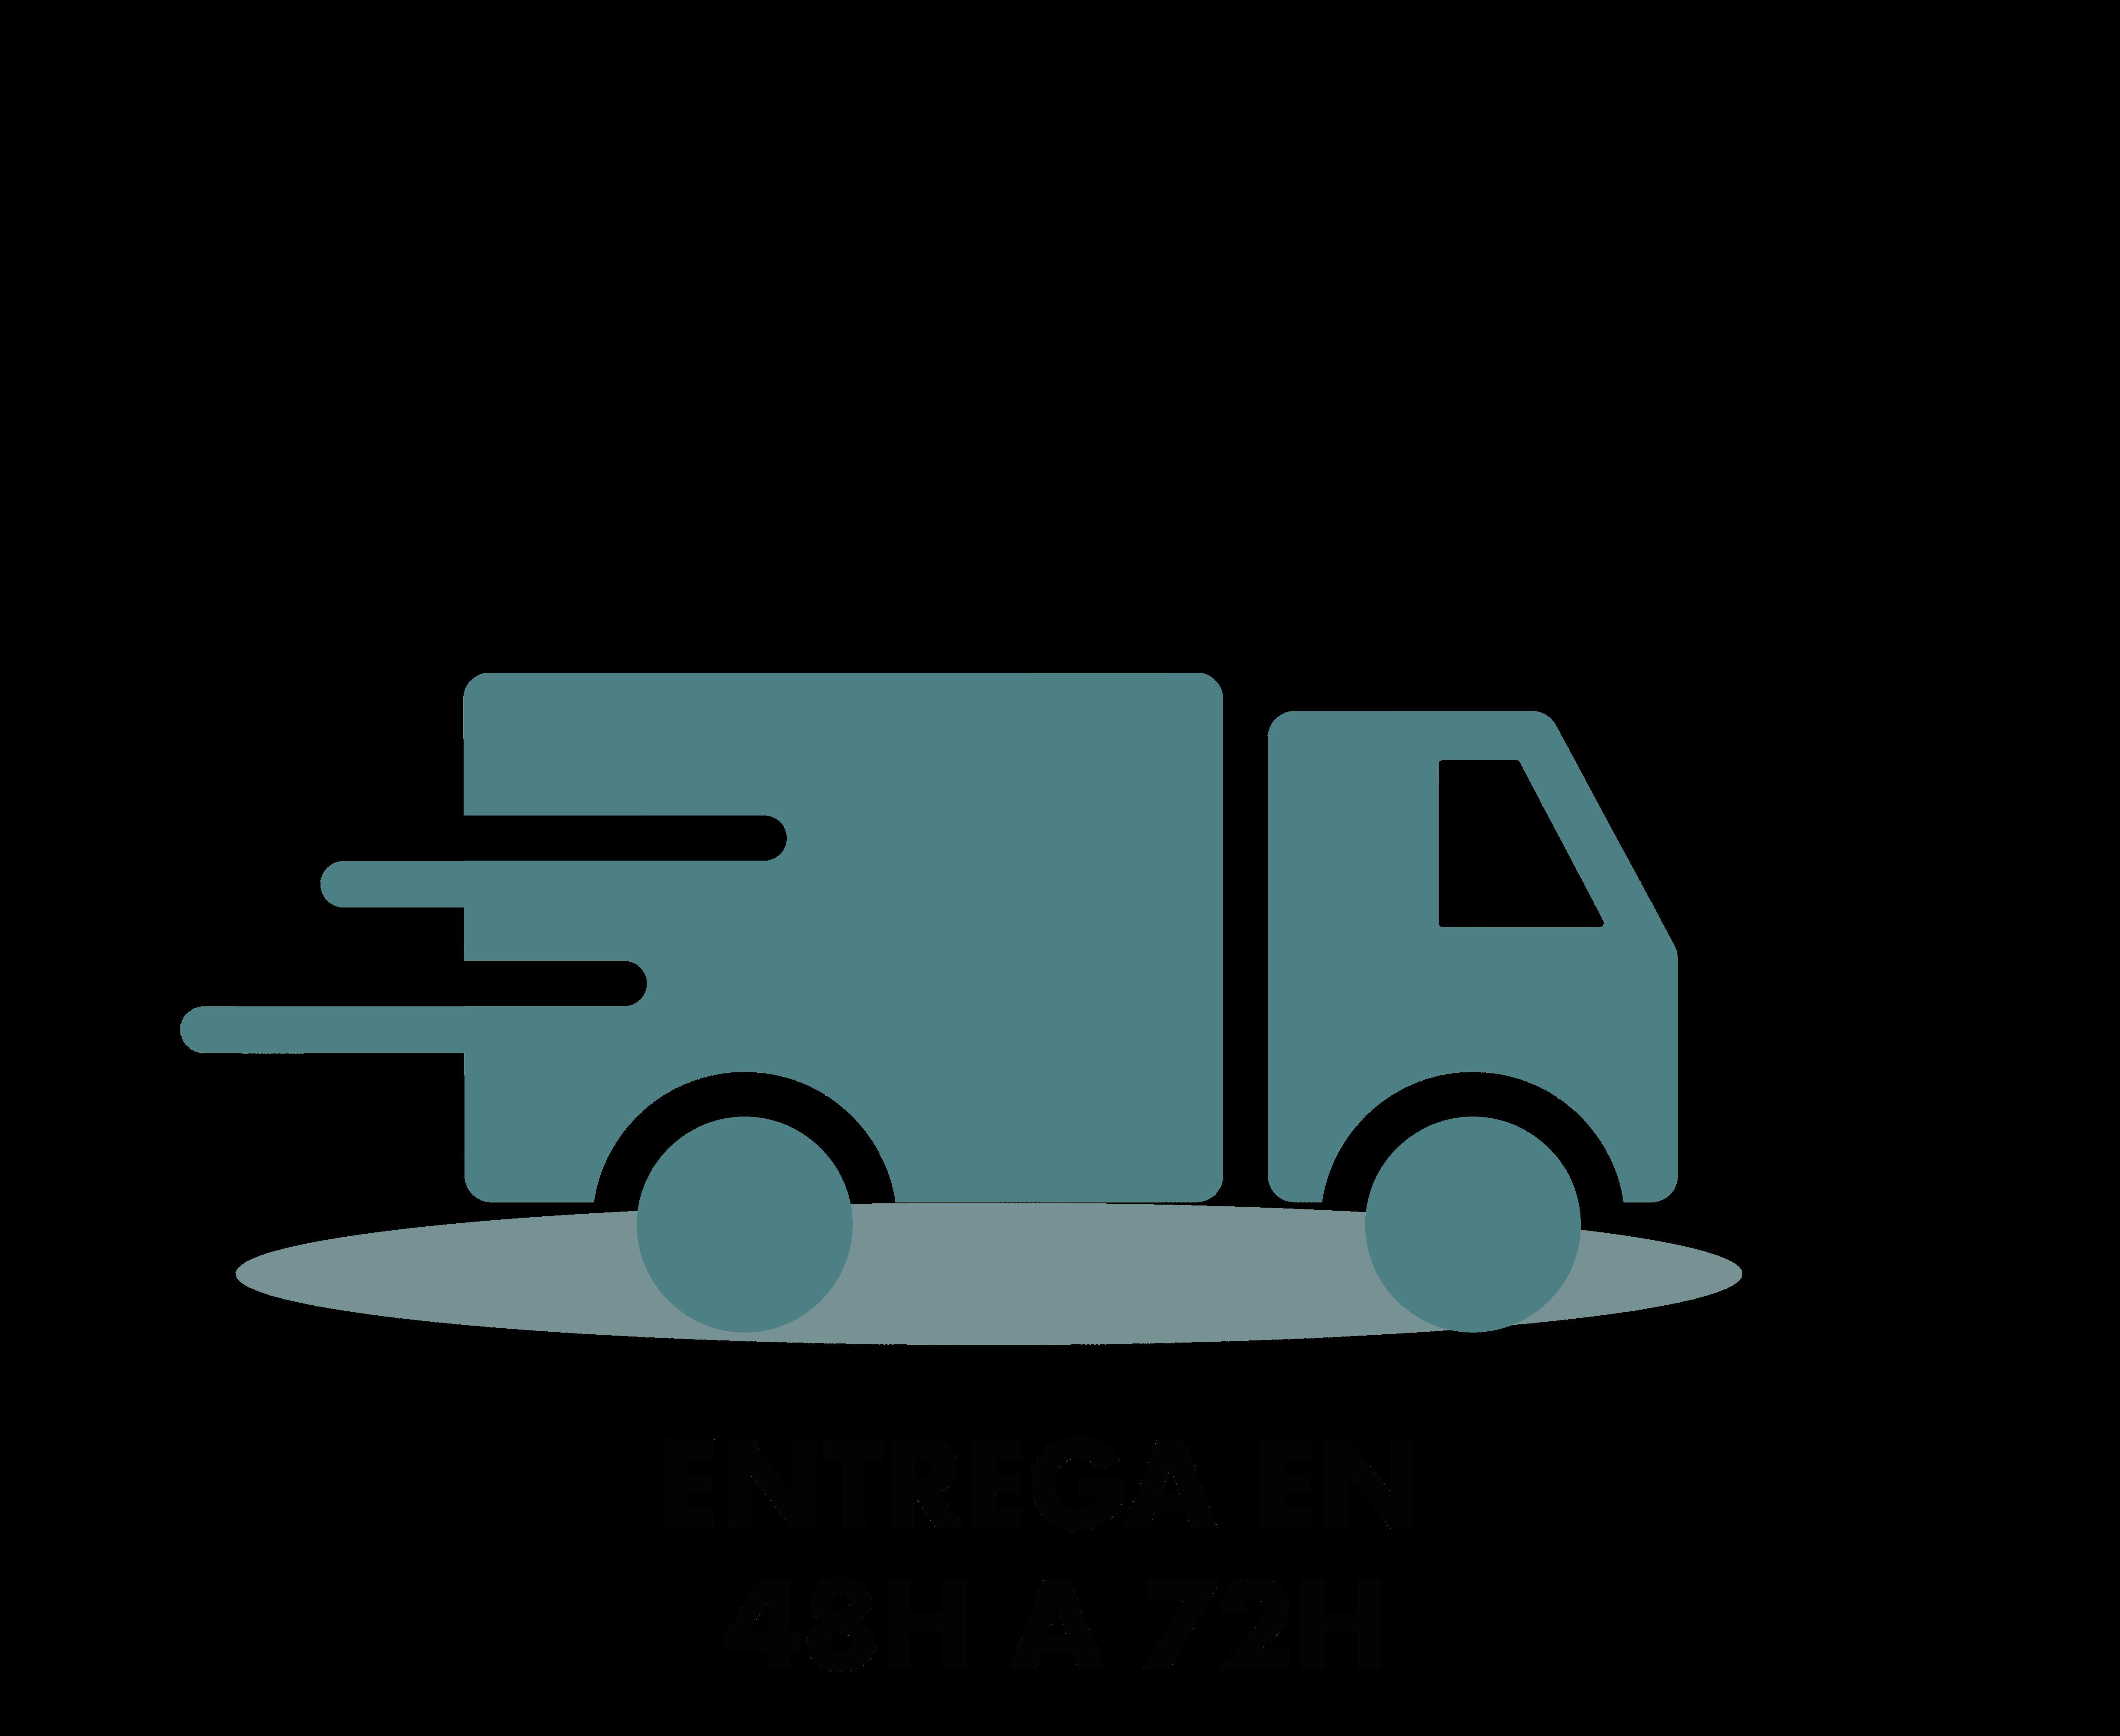 V2 logo livraison couleur ESS